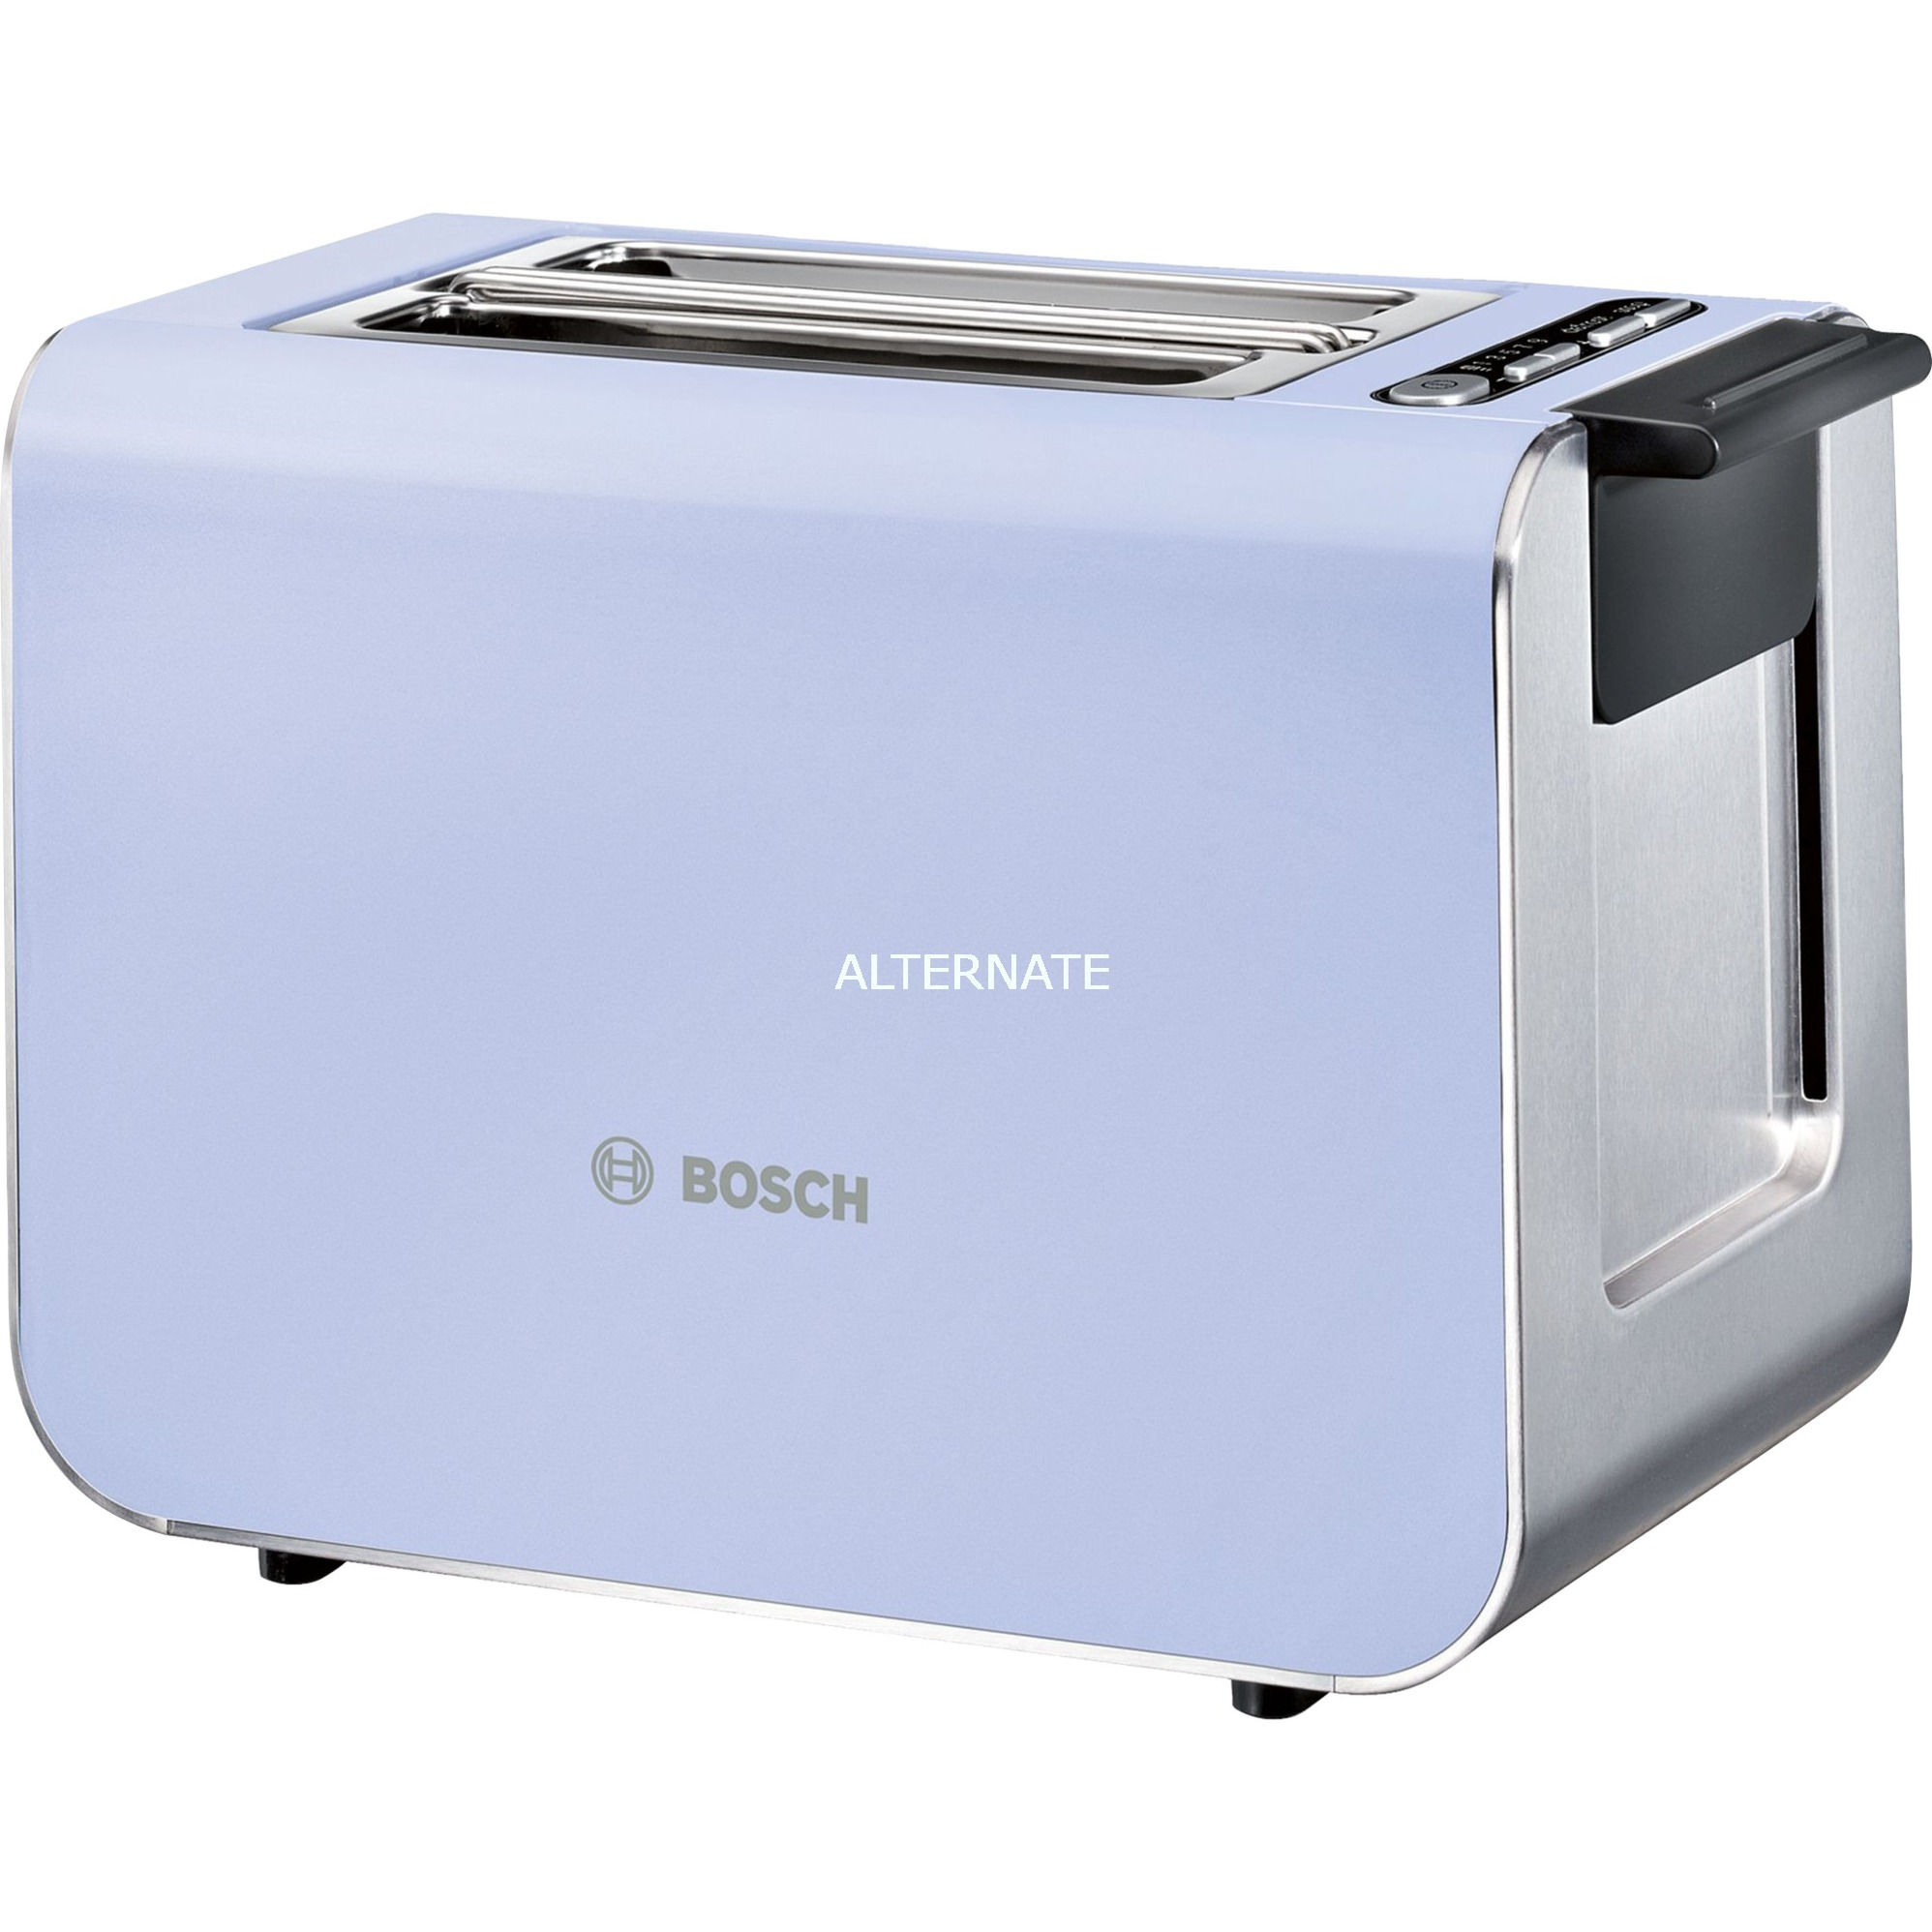 Bosch tostapane prezzi migliori offerte for Prezzi tostapane